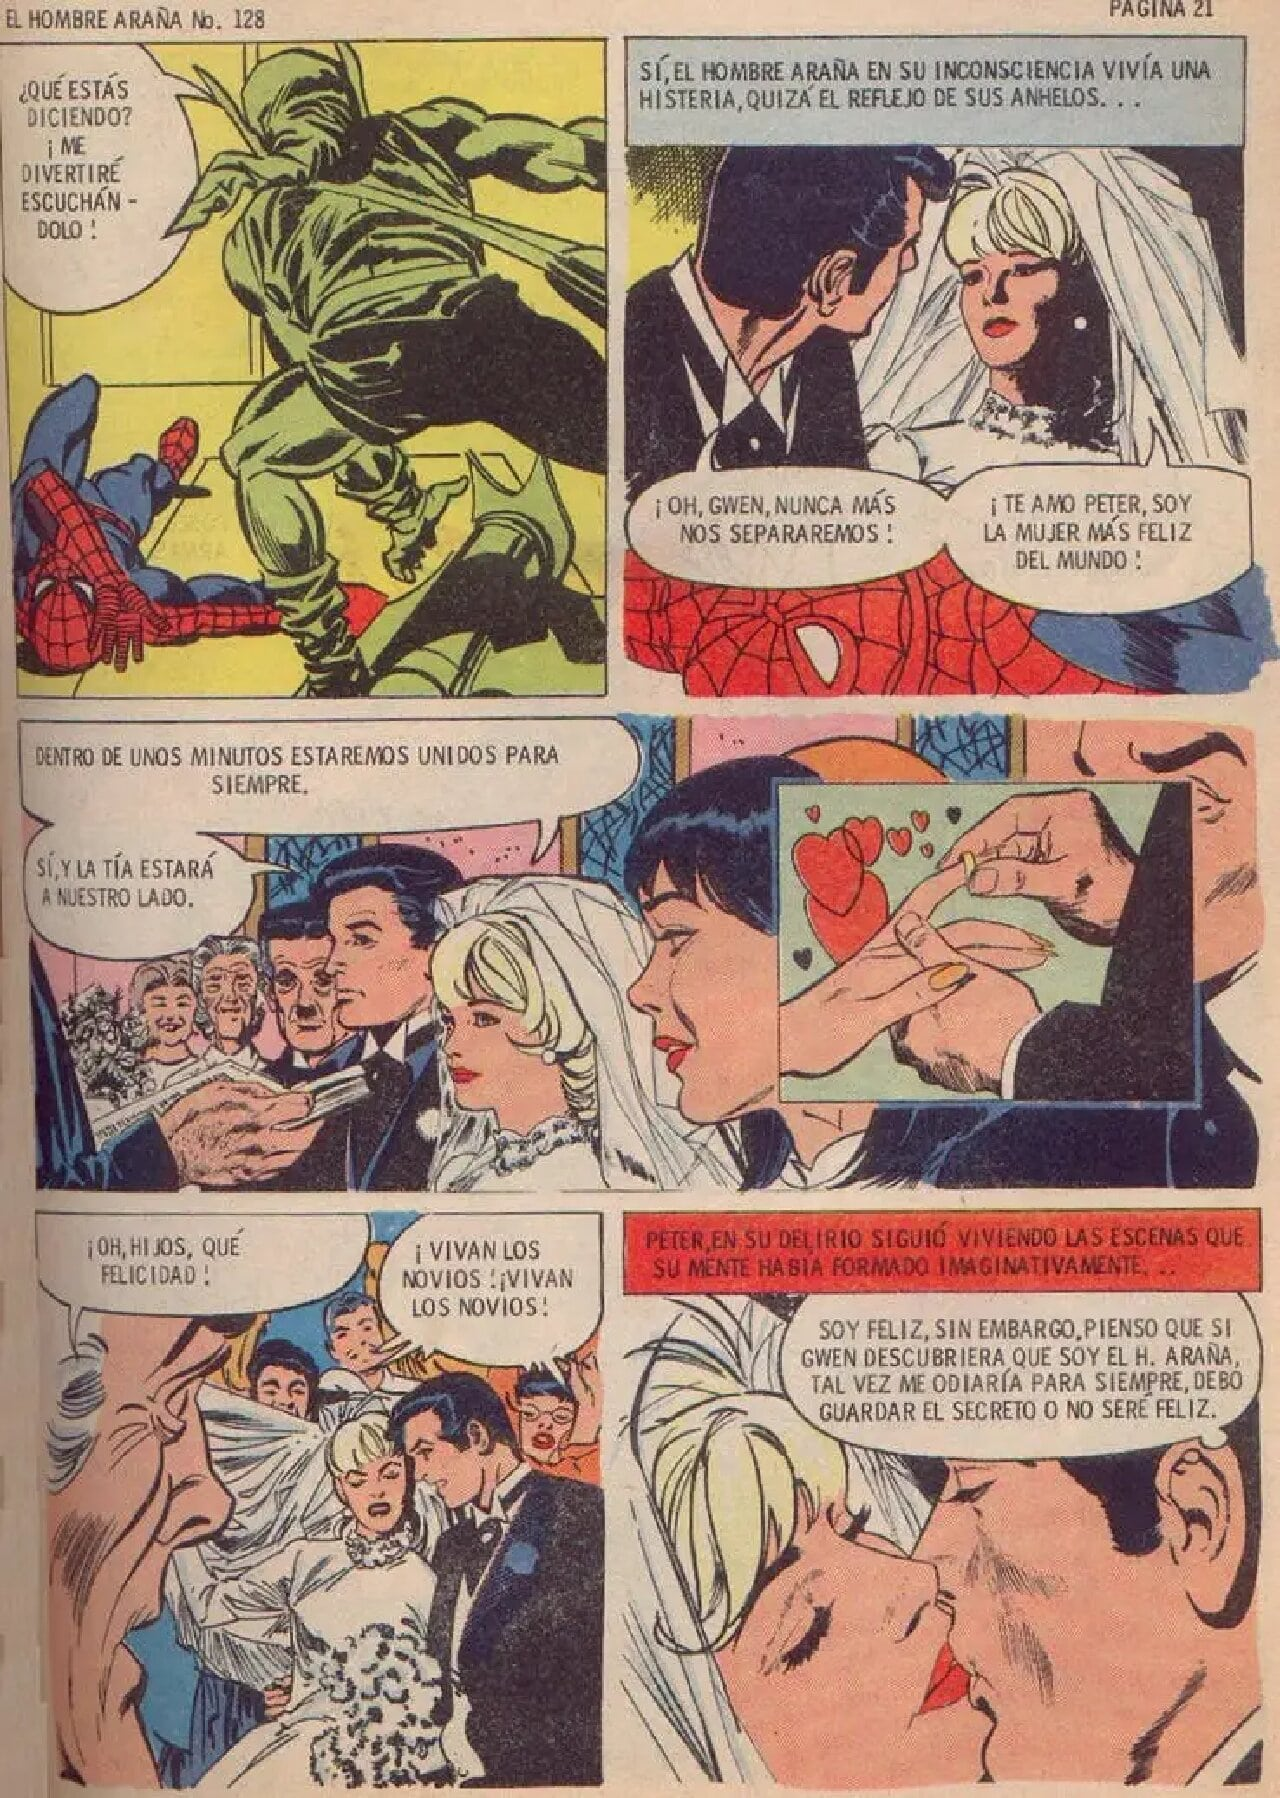 spider-man méxico boda peter parkr gwen stacy